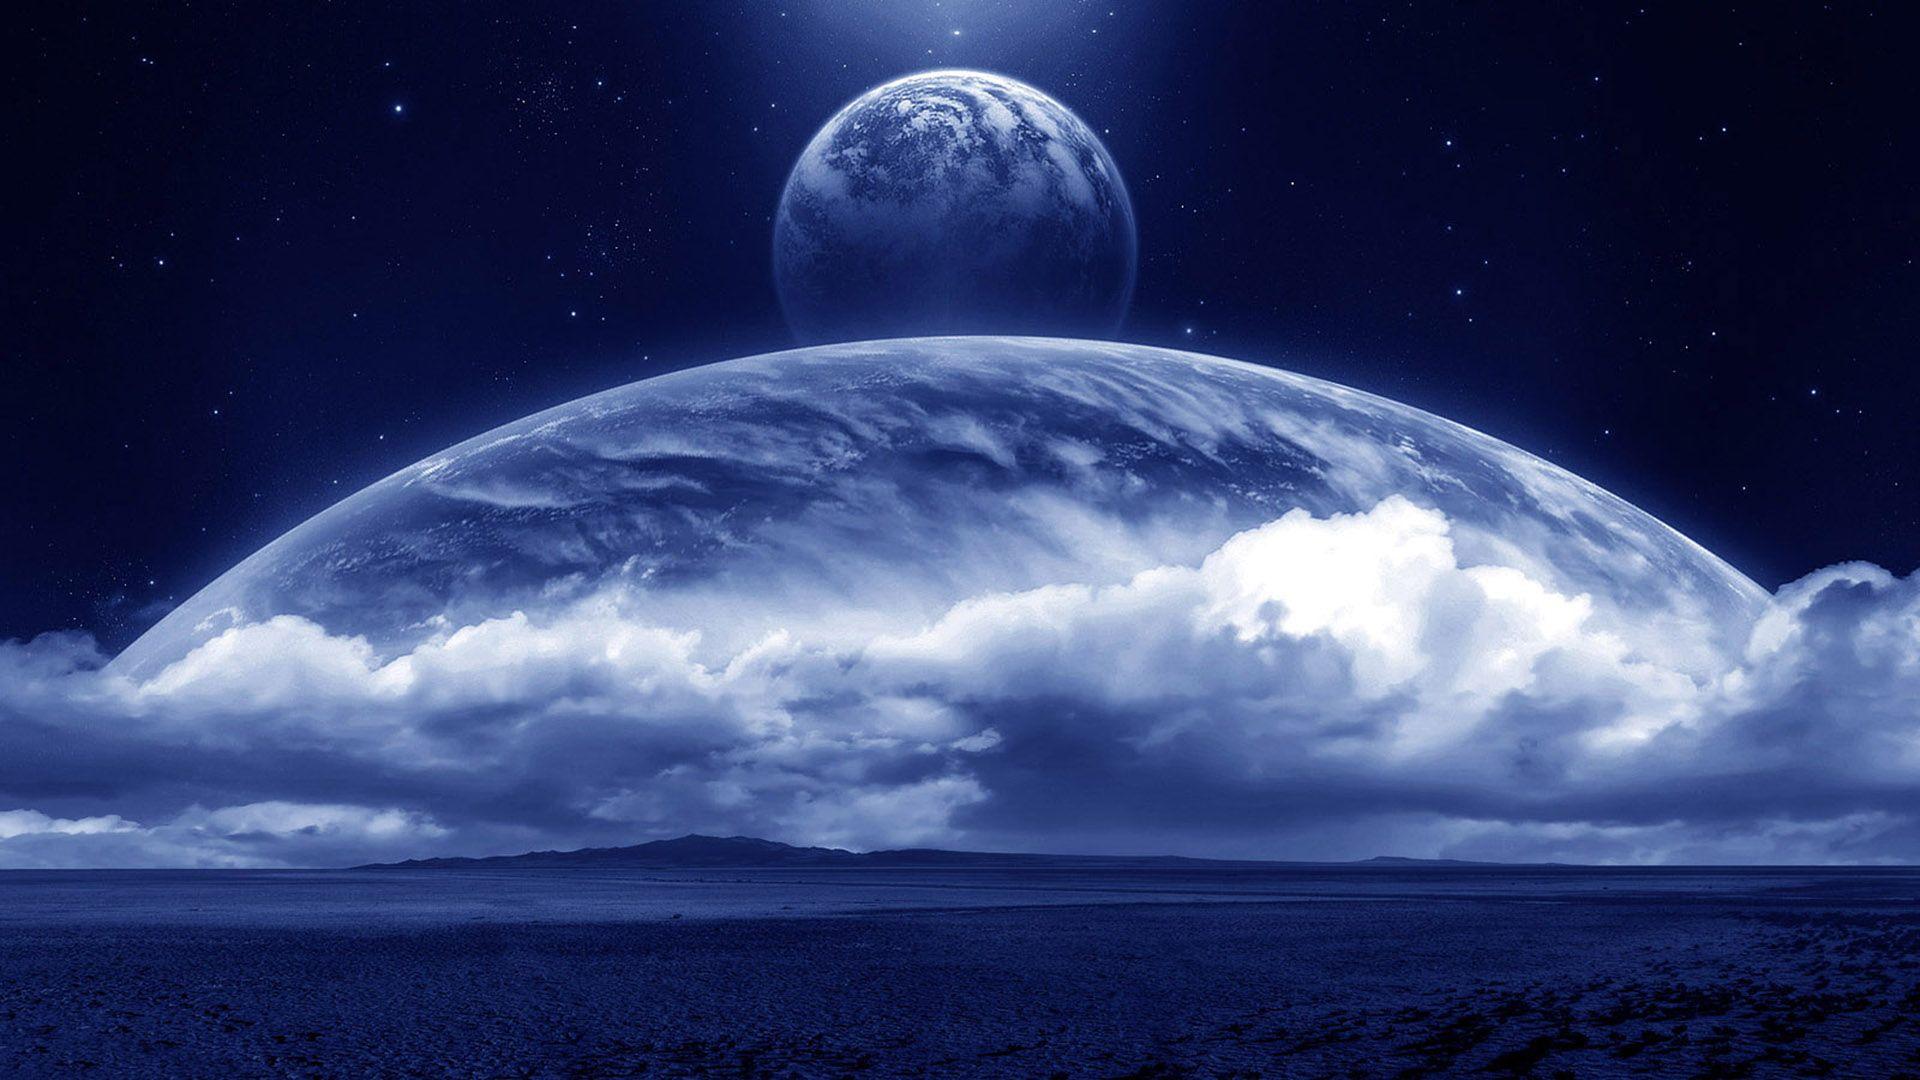 Fondos De Pantalla Tema Universo Hd 1080p Planetas Del